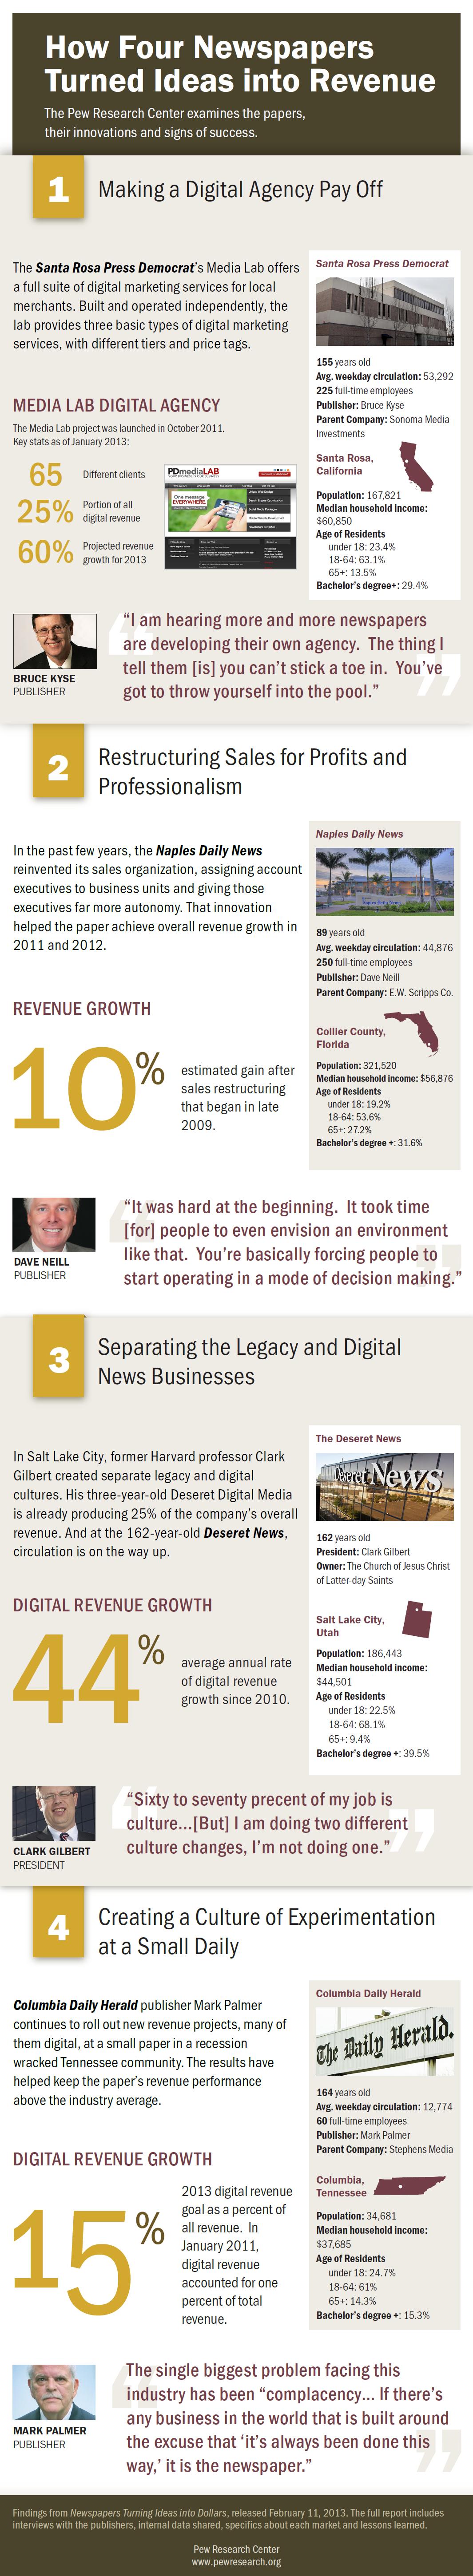 PJ_13.02.05_casestudies-Infographic